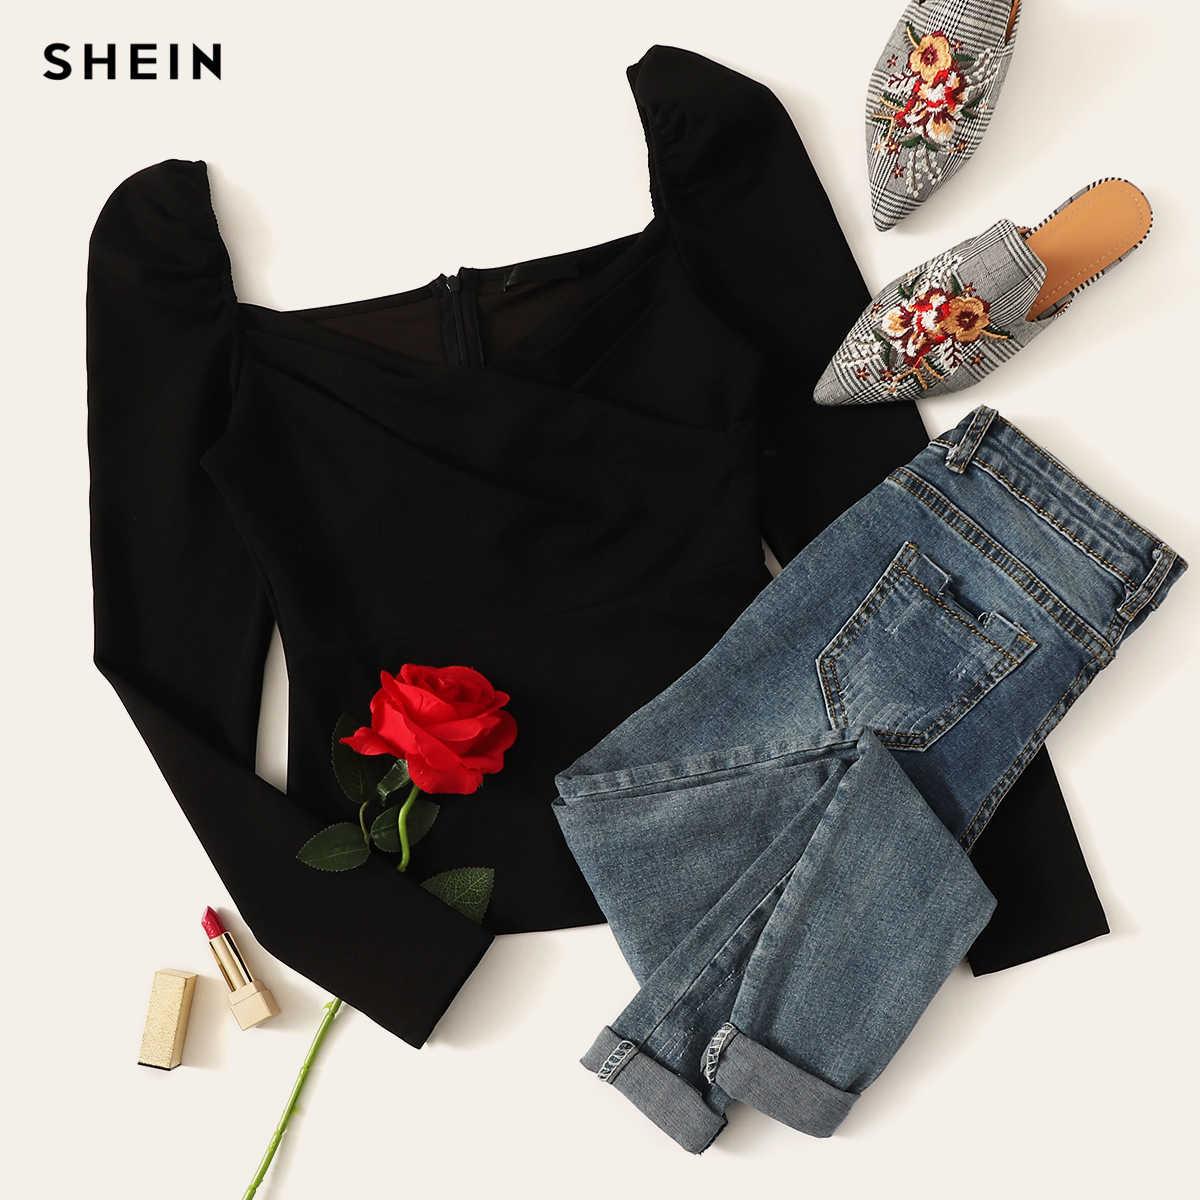 Shein sexy zip voltar puff manga fina cabida envoltório querida pescoço blusa feminina sólido topo primavera clube blusas de rua alta